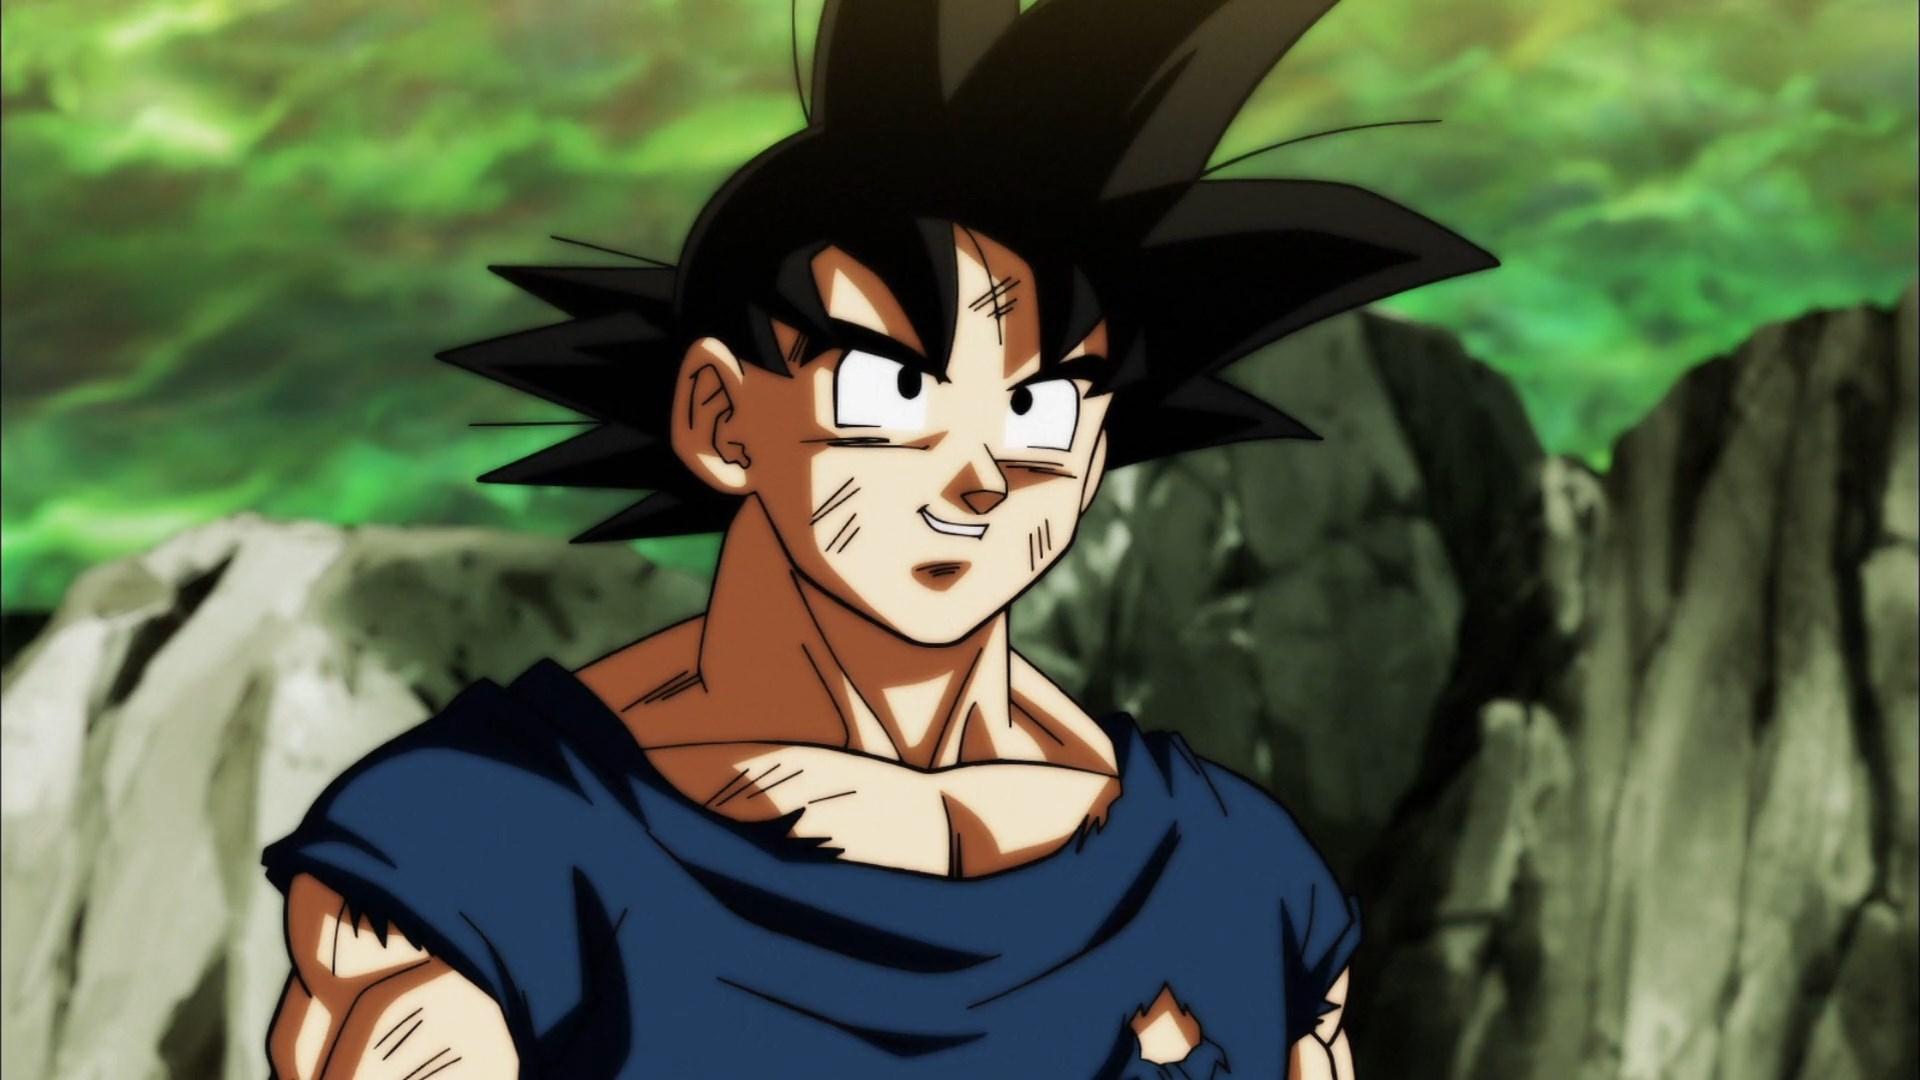 [HorribleSubs] Dragon Ball Super - 121 [1080p].mkv_snapshot_21.31